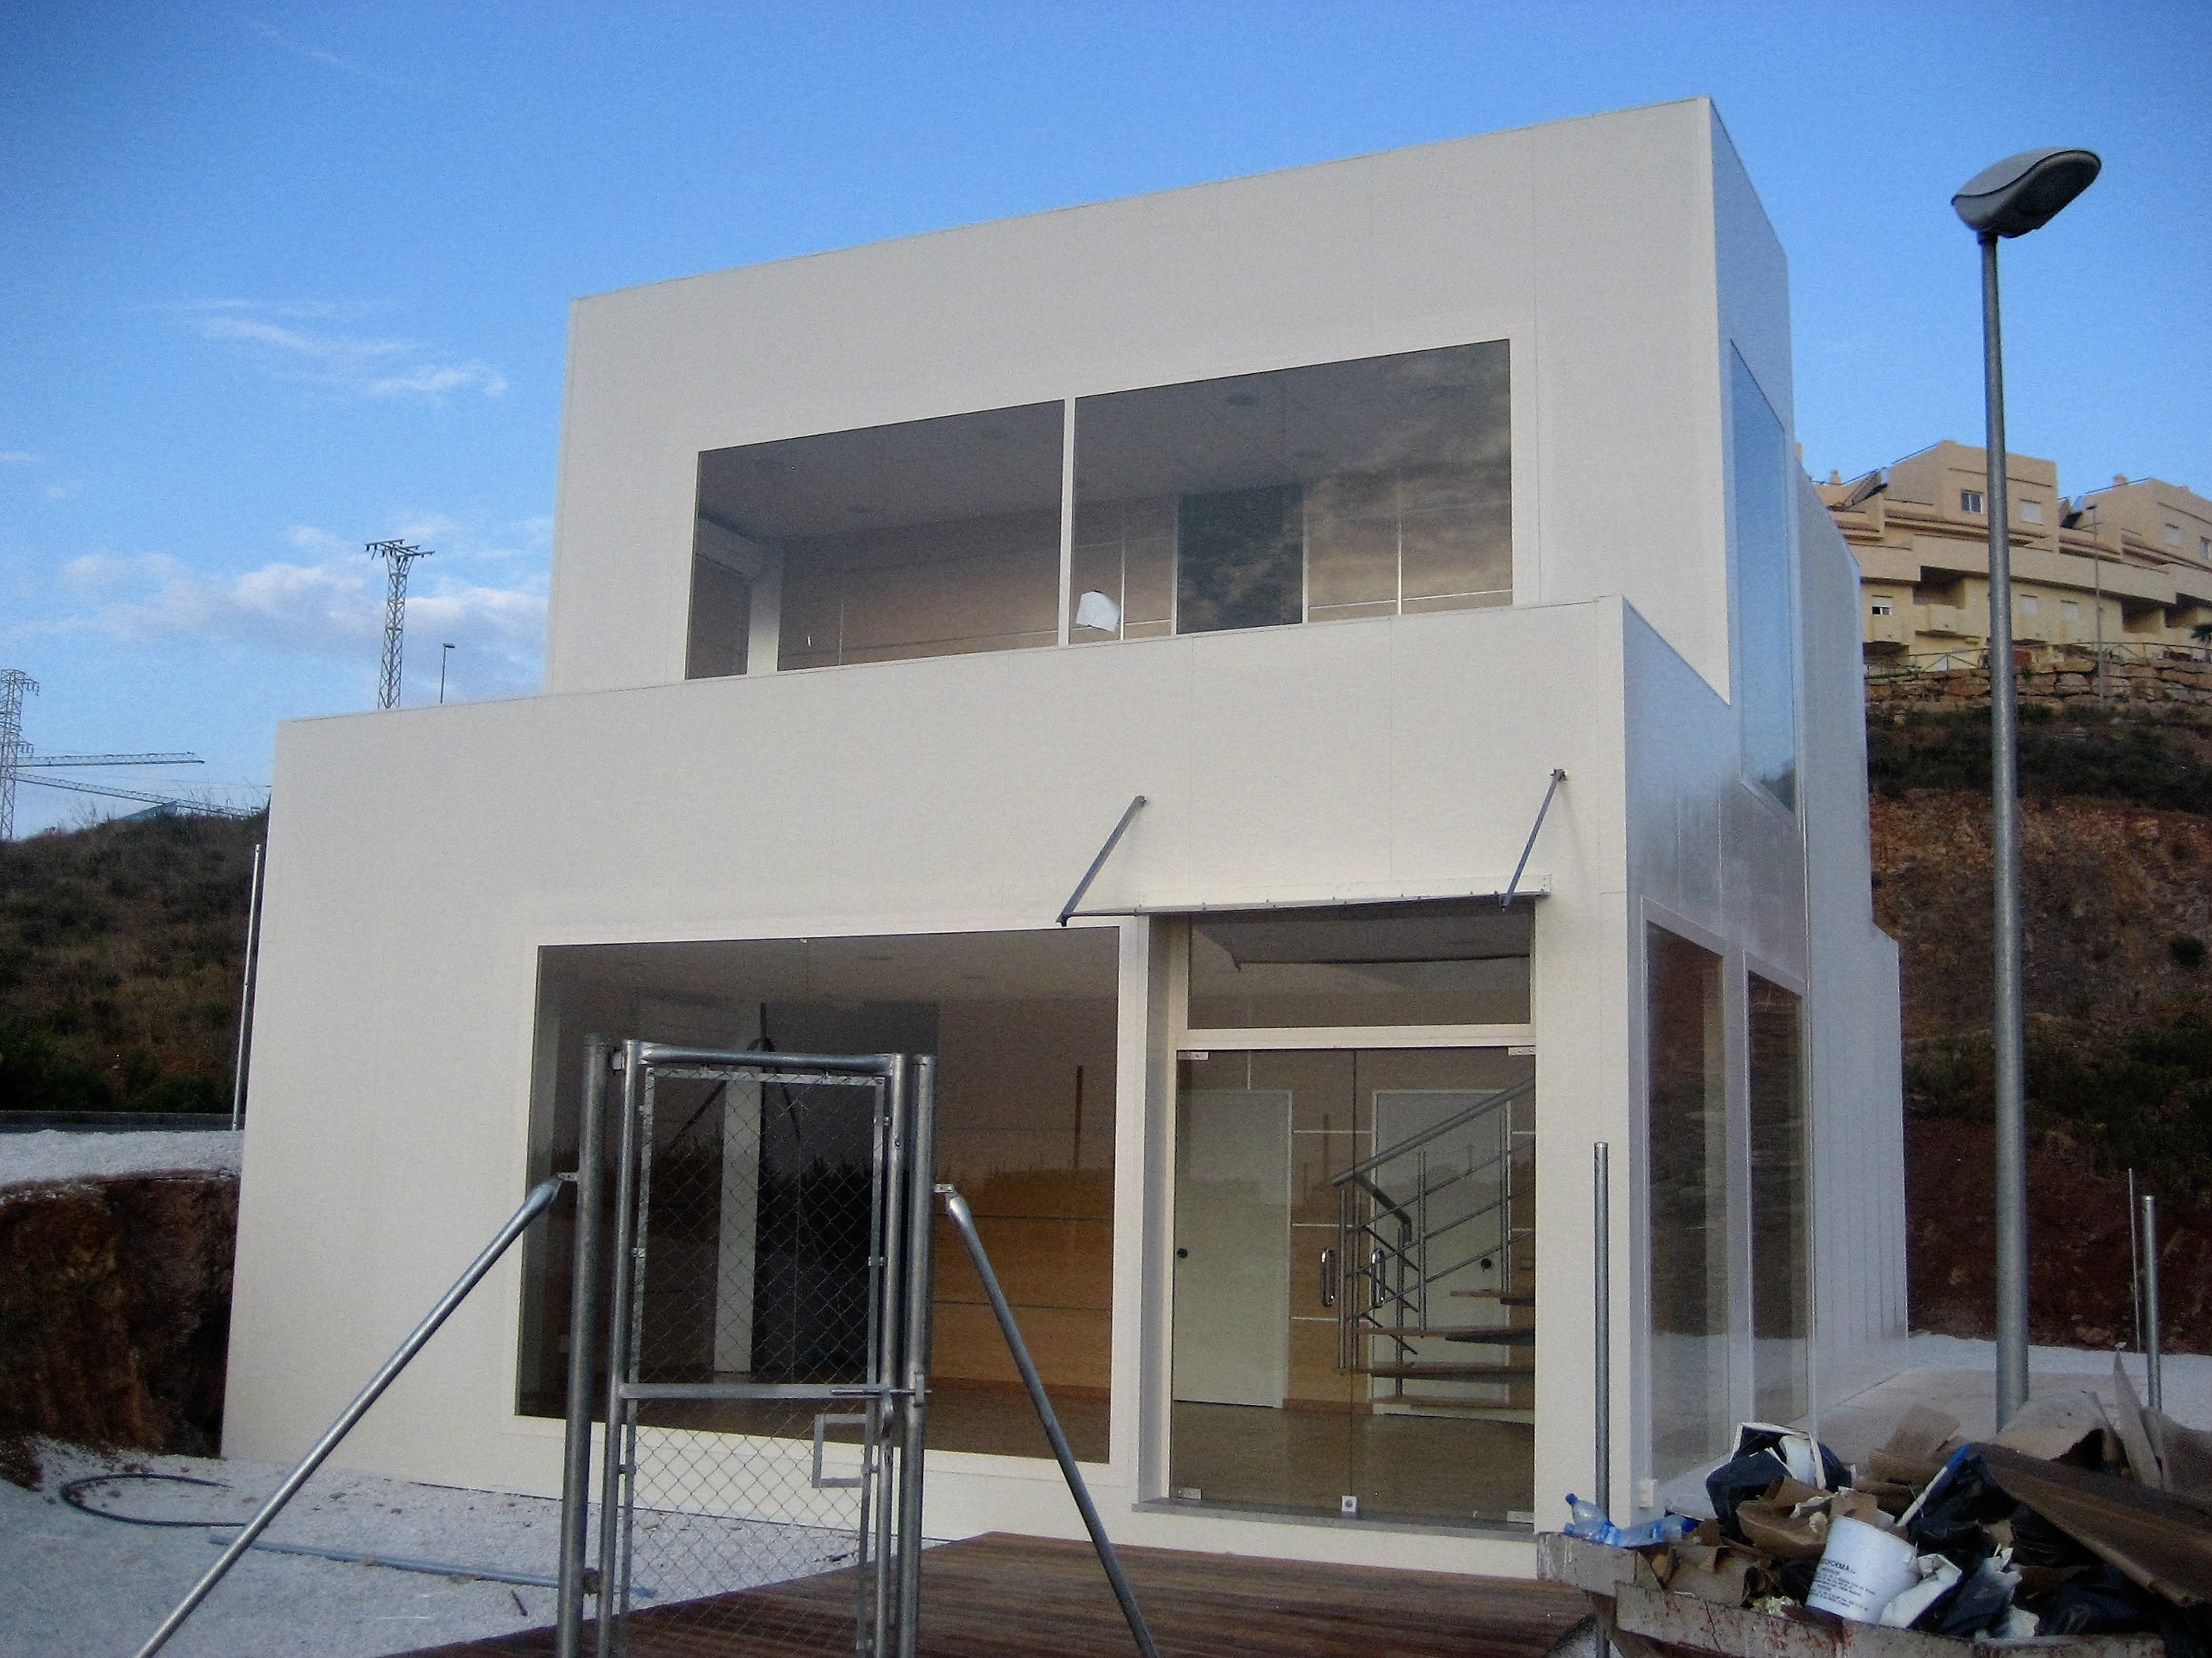 Test house no 1